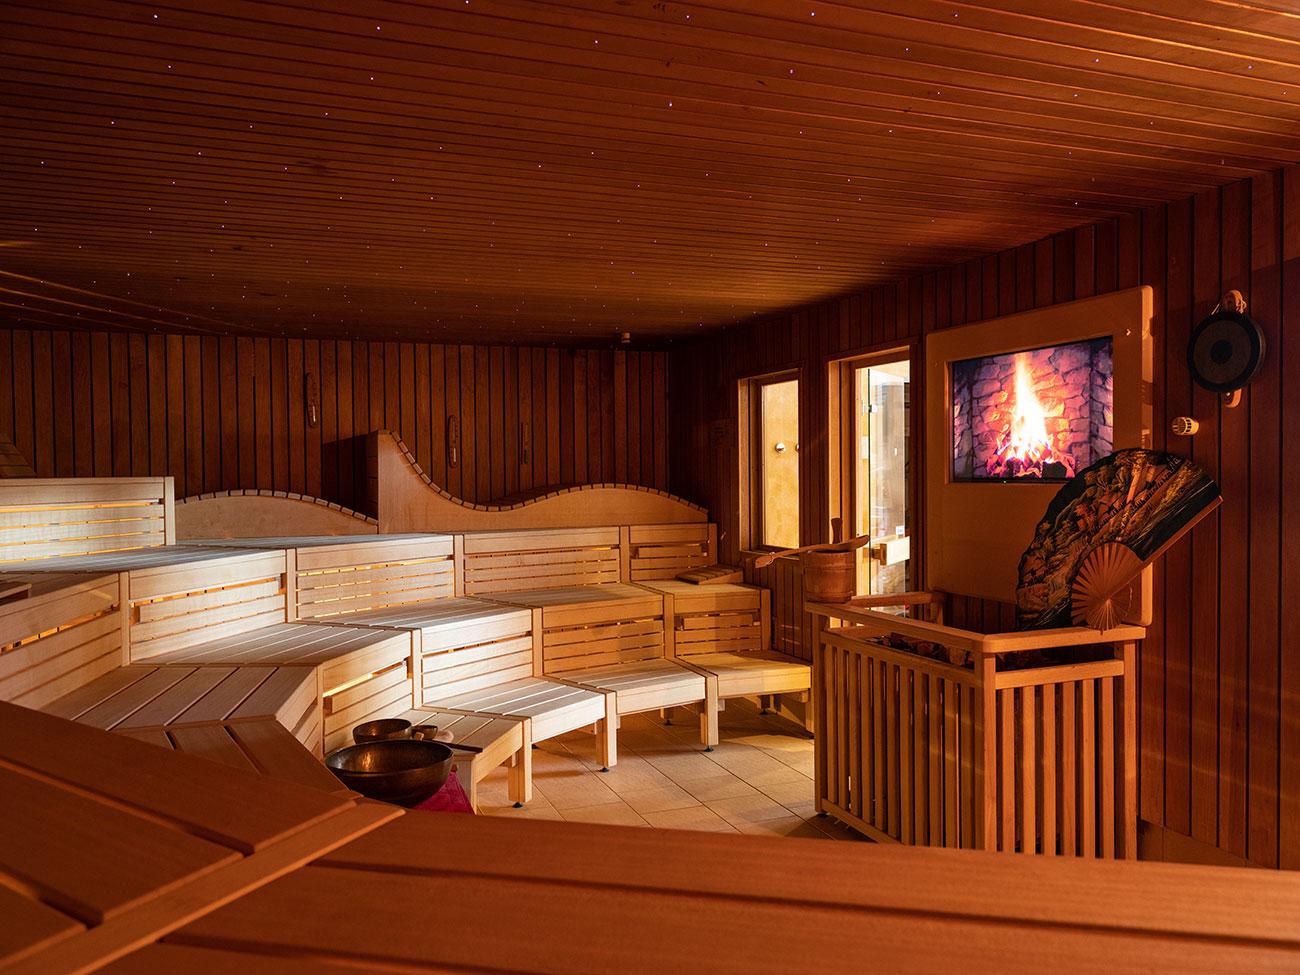 Interieur-Fotograf für Therme Aqua Salza